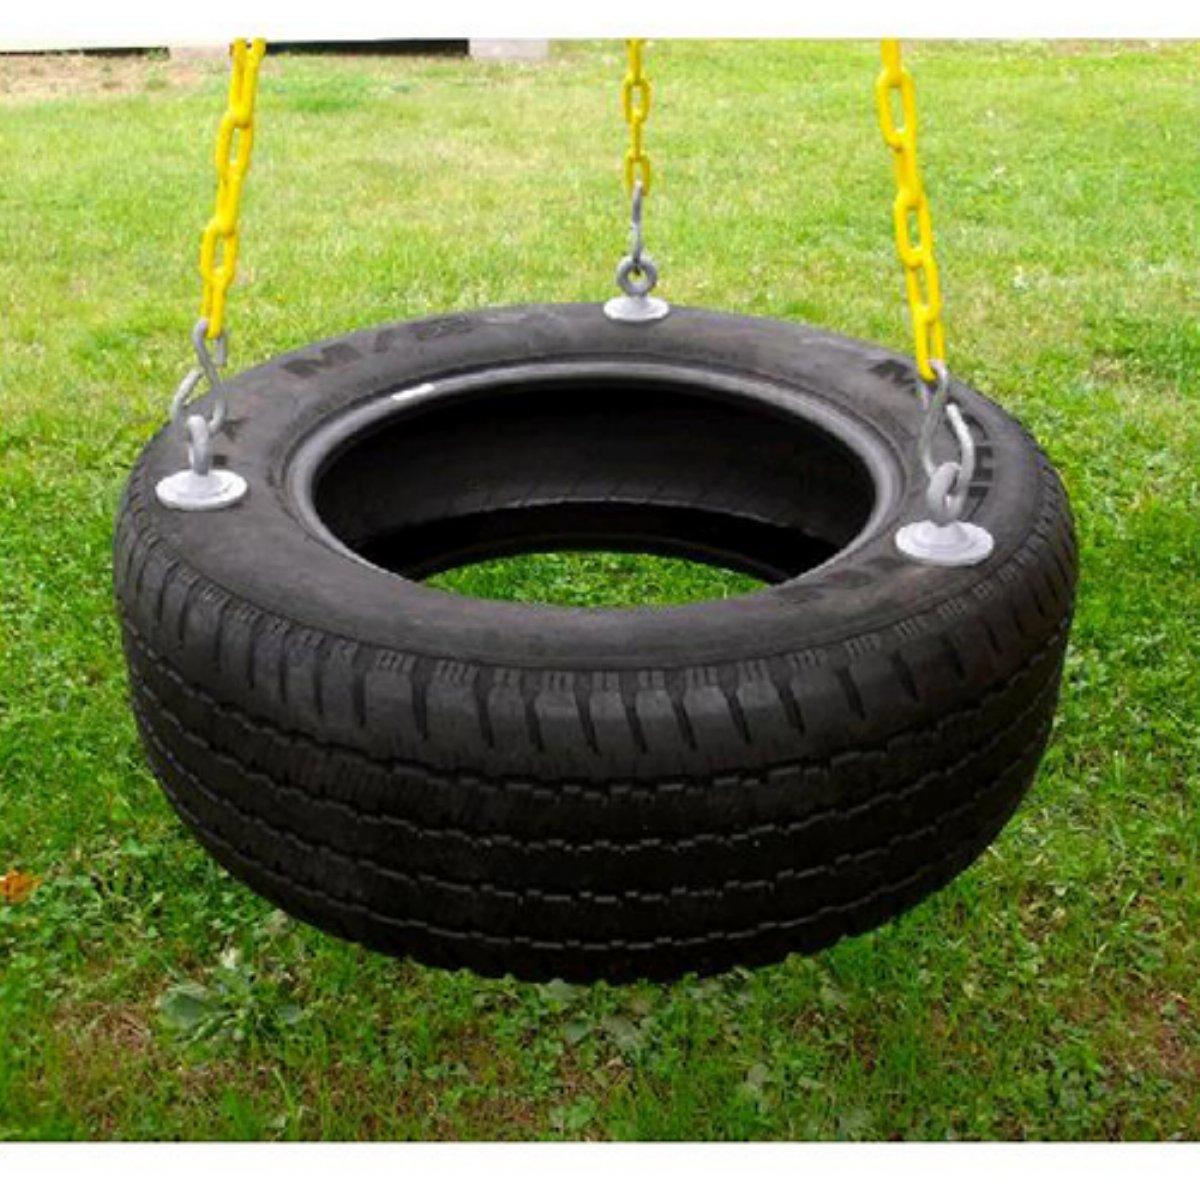 doreena 39 s place 07 03 13 cpc tire swing